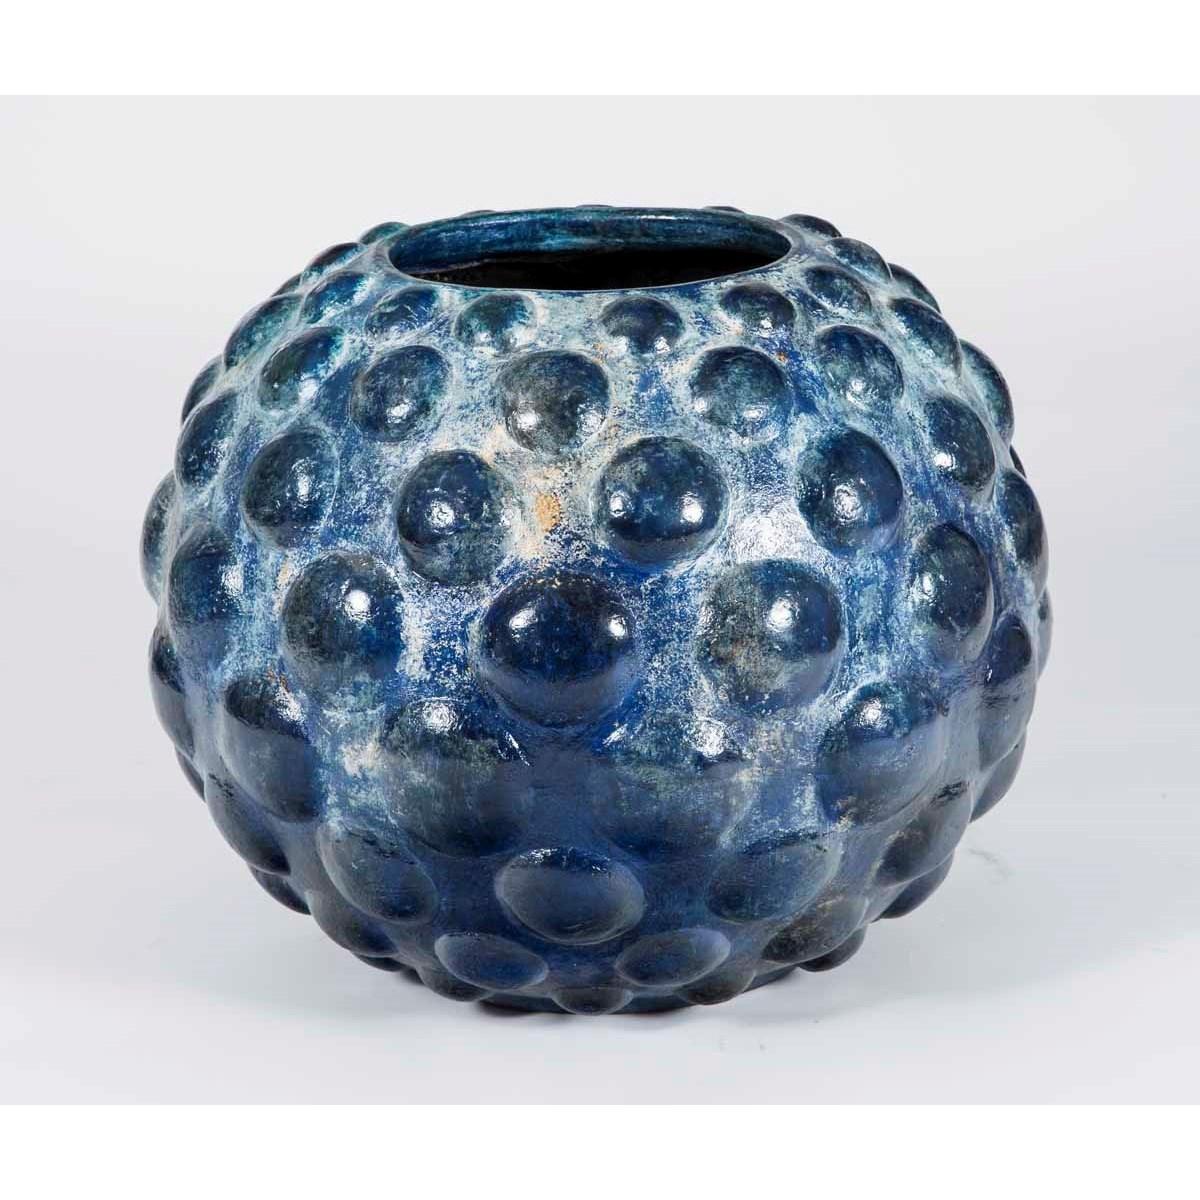 Large Floor Pot in Blue Cloud Finish